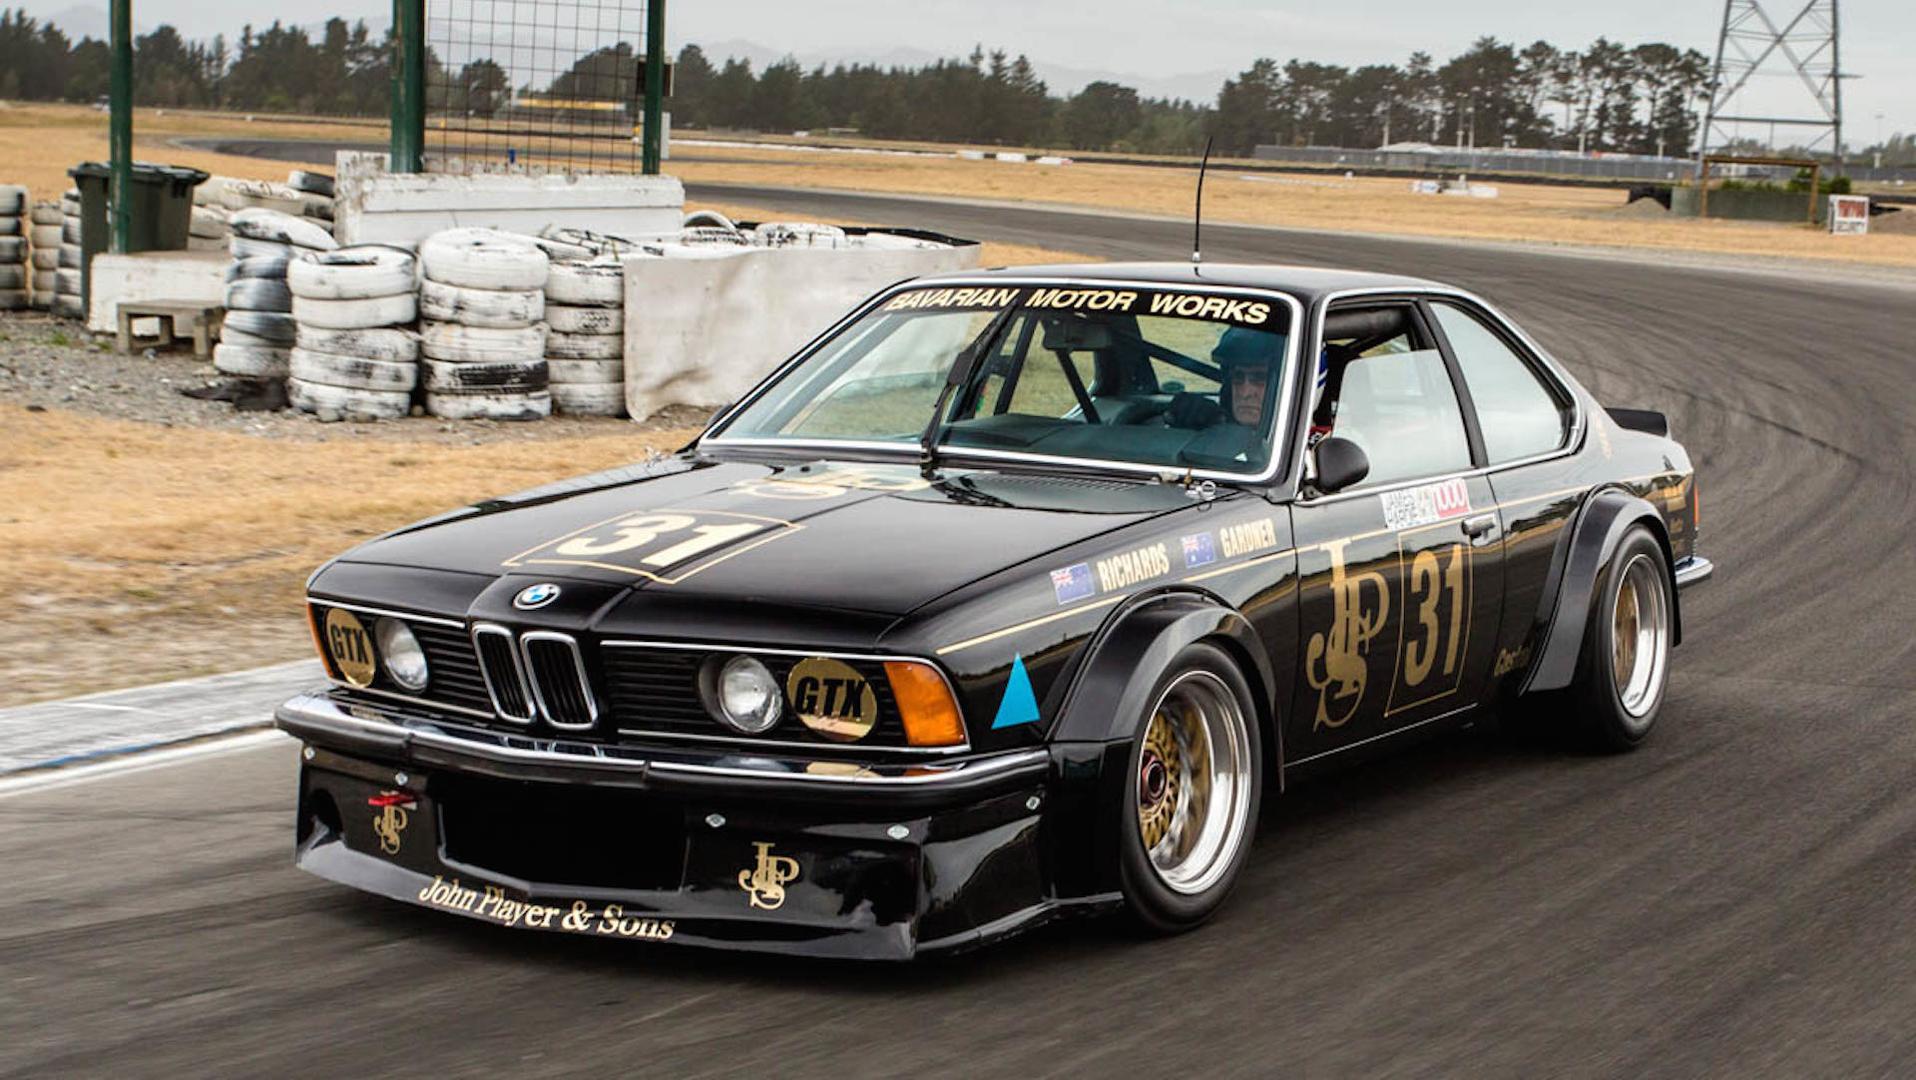 Legendary BMW 635 CSi Black Beauty Returns To The Track